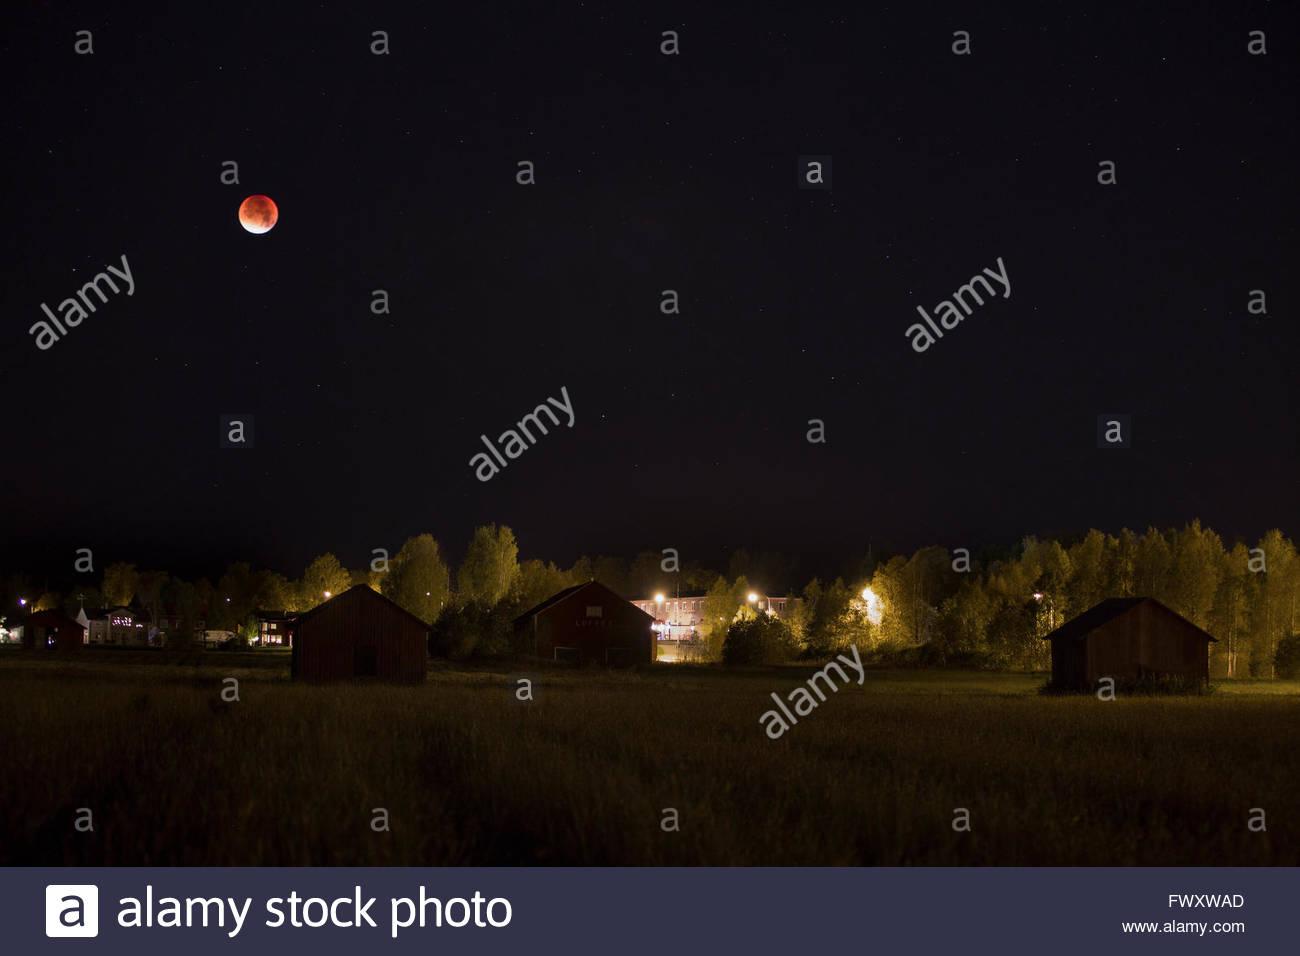 Sweden, Vasterbotten, Umea, Moon over residential district - Stock Image